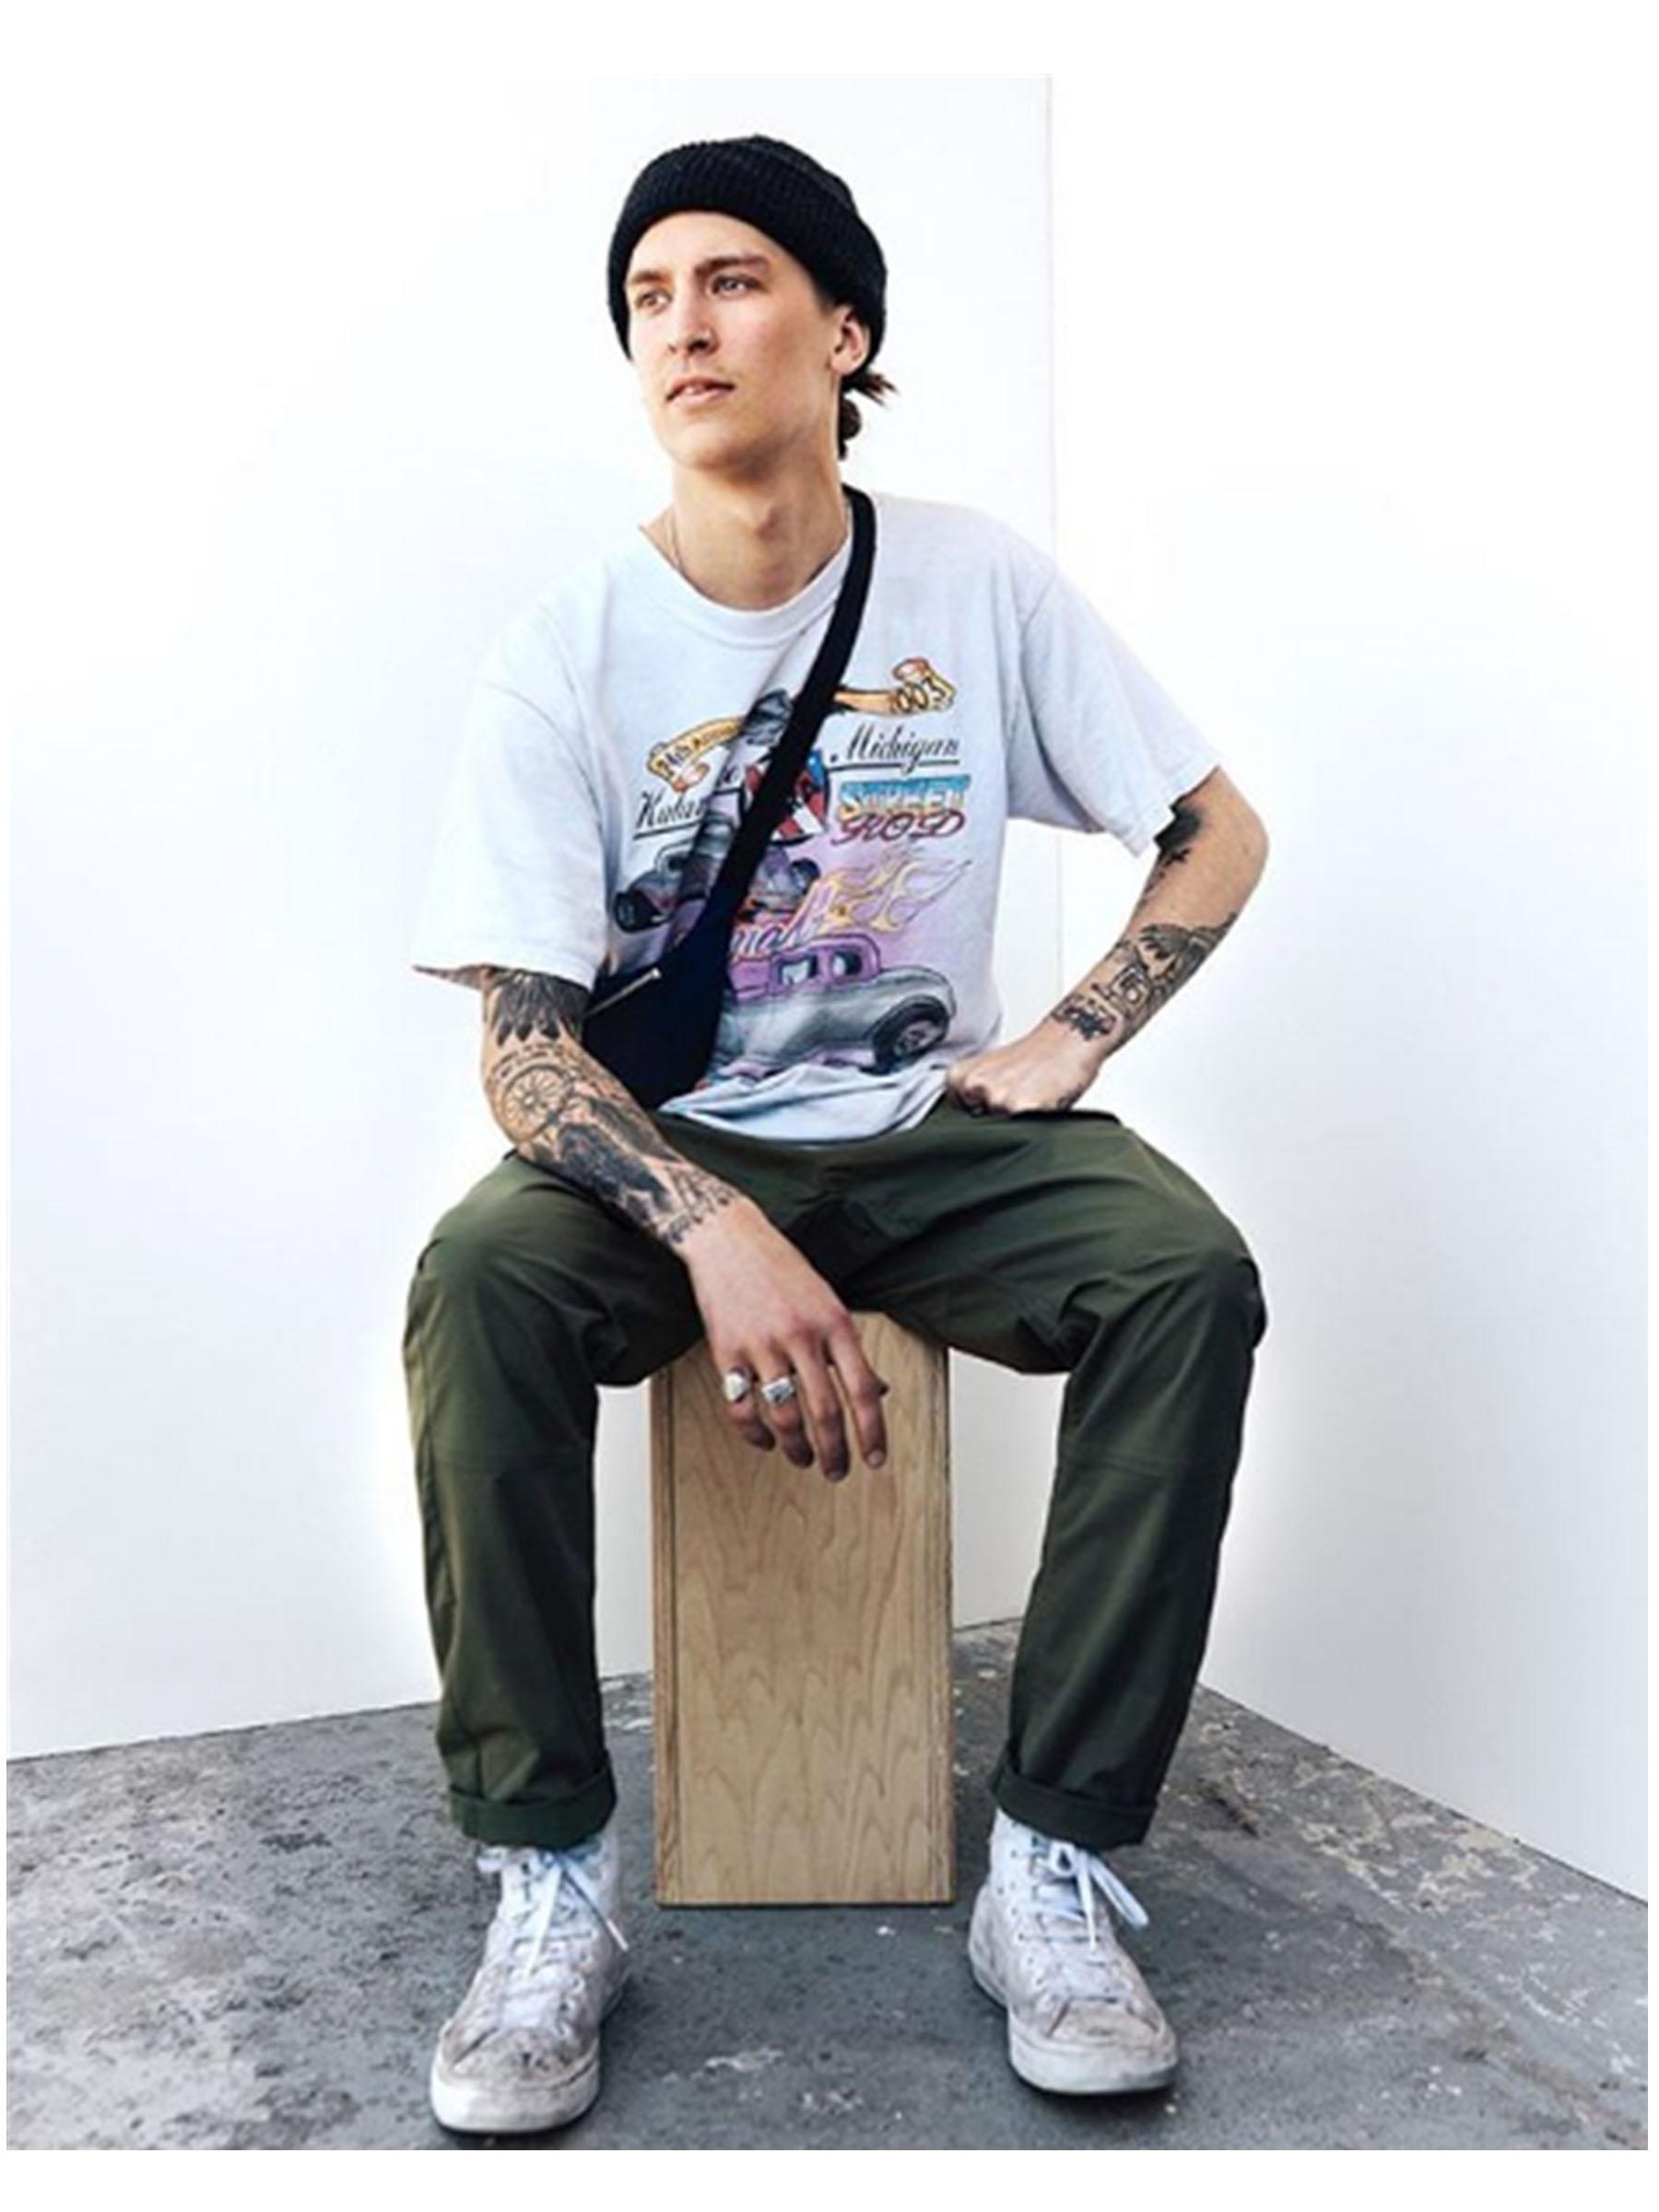 Sleestak is a blackwork tattoo artist in Toronto. Find him on pick the ink. @x.sleestak.x.